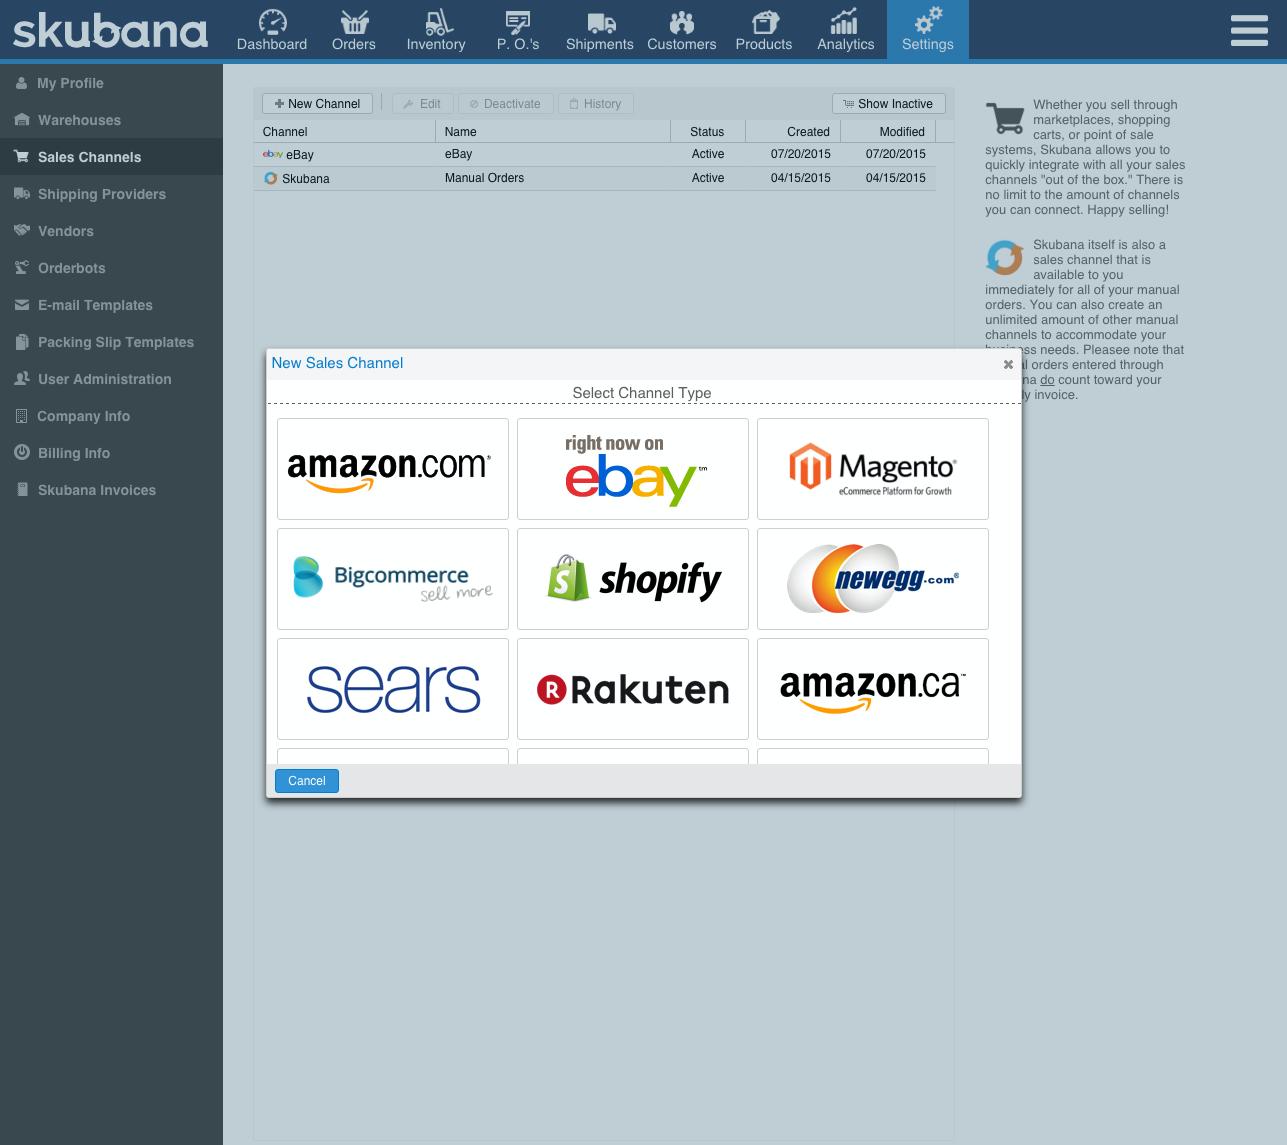 Skubana Software - 6